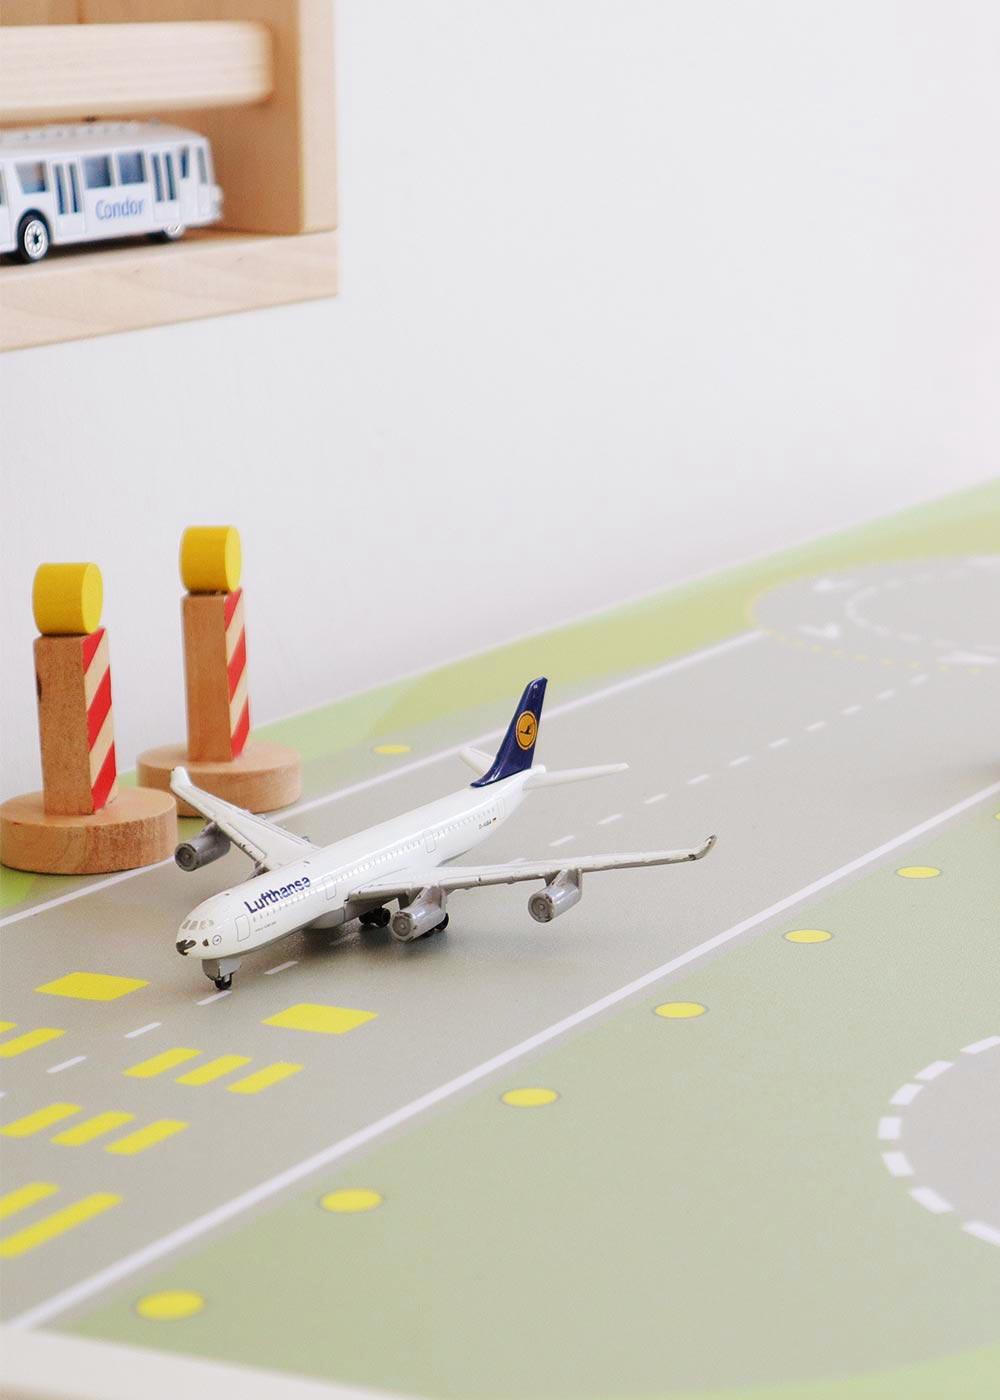 Ikea Kallax Regal Landebahn 4fach Komplettansicht mit Landung